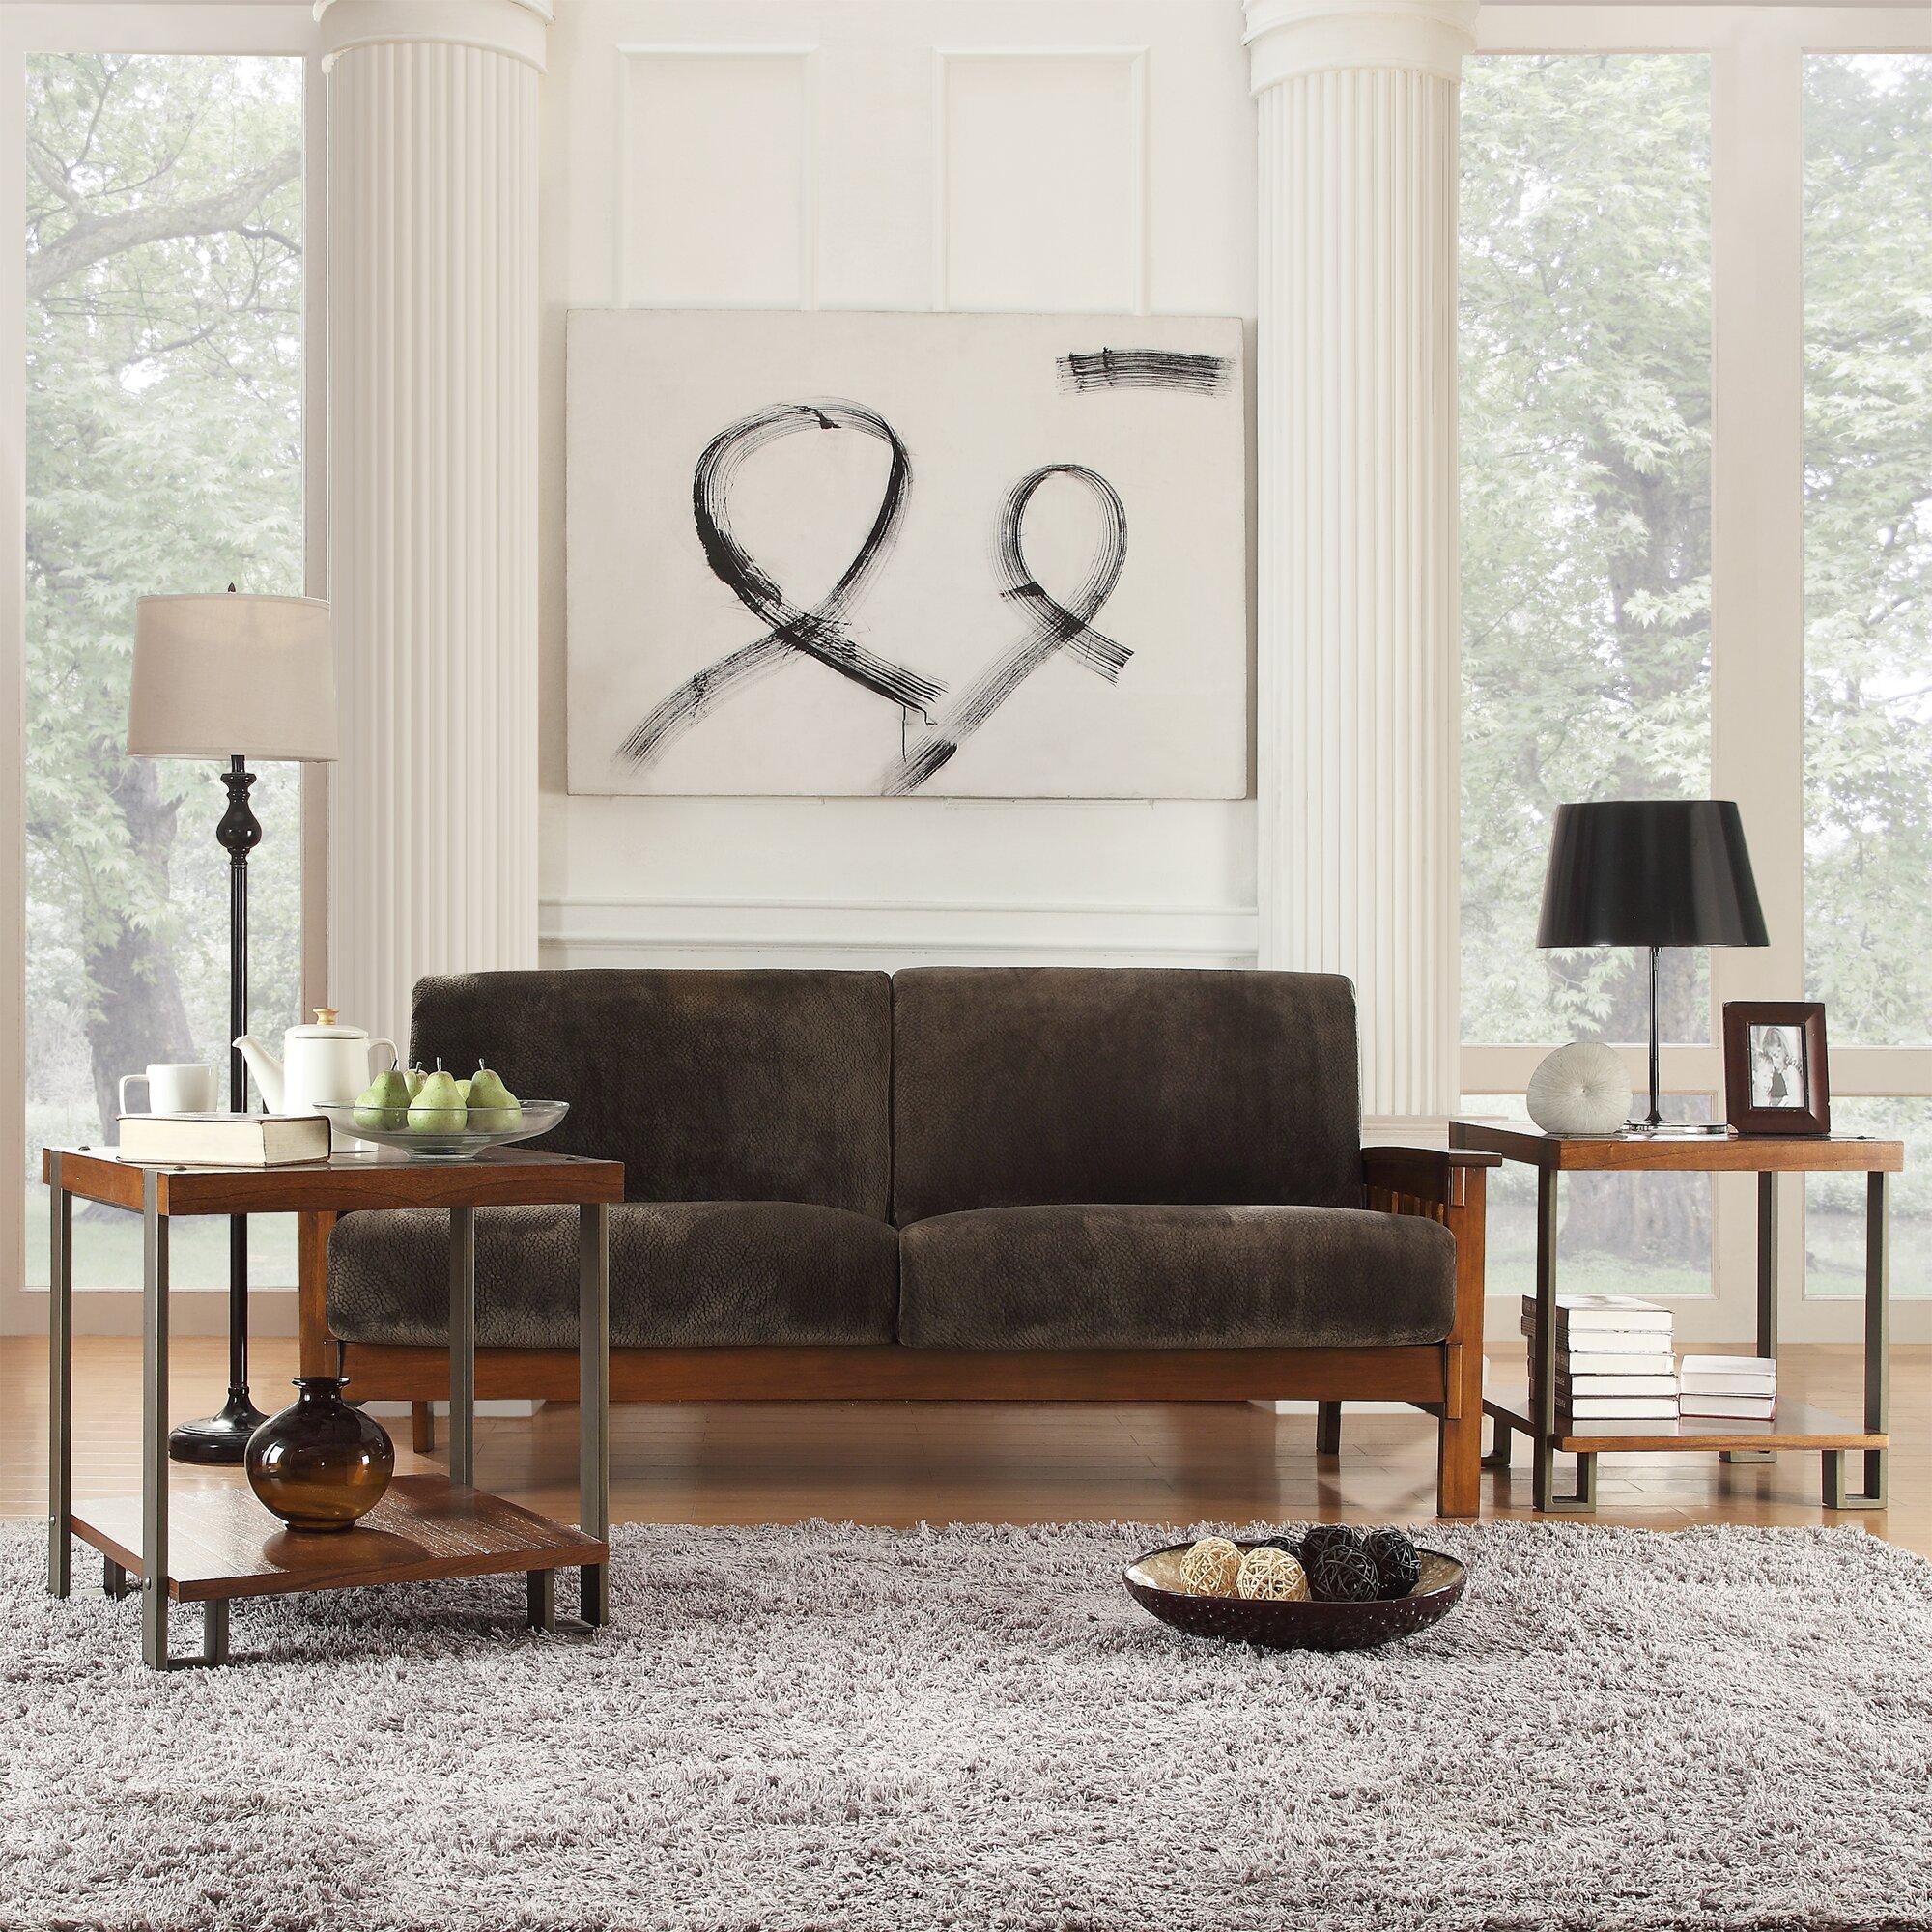 Kingstown Home Warner Mission Sofa Amp Reviews Wayfair